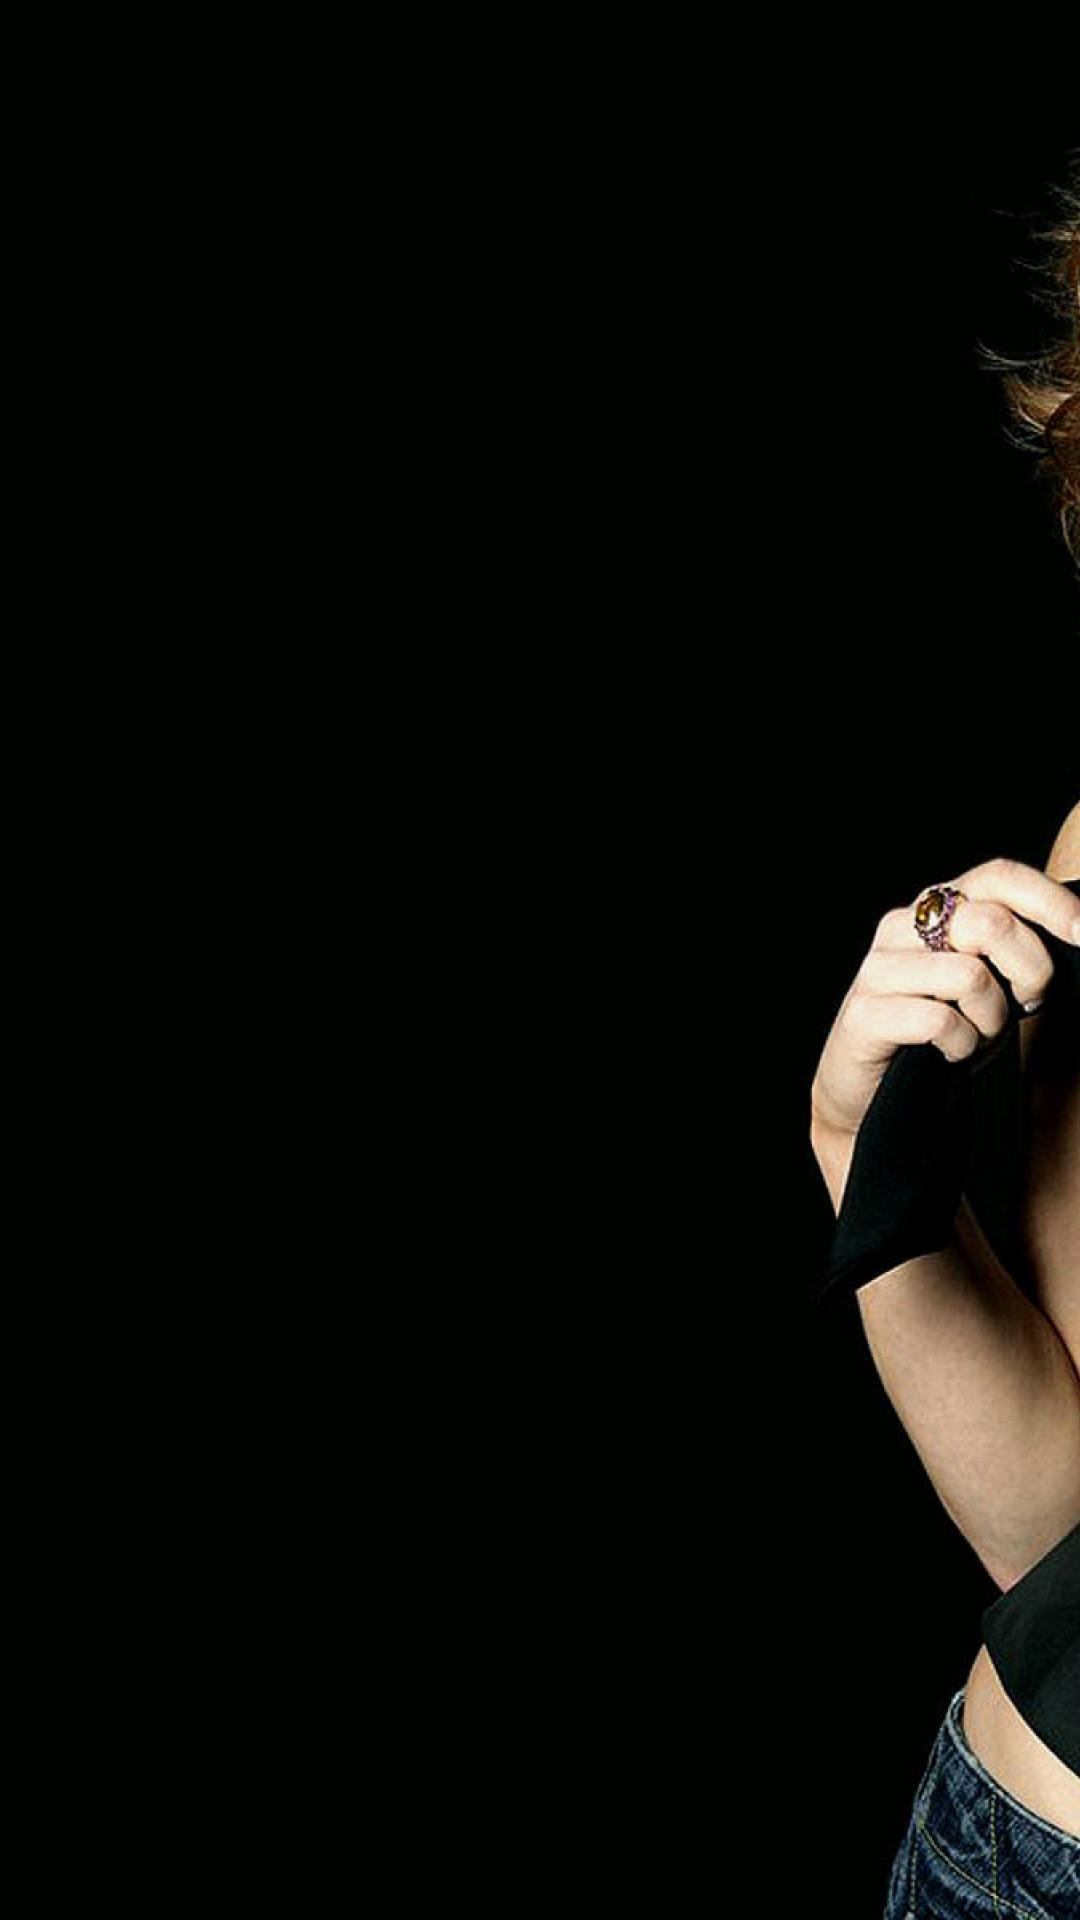 Alyson Hannigan Photoshoot 1080x1920 alyson hannigan stunning hd pics iphone 7, 6s, 6